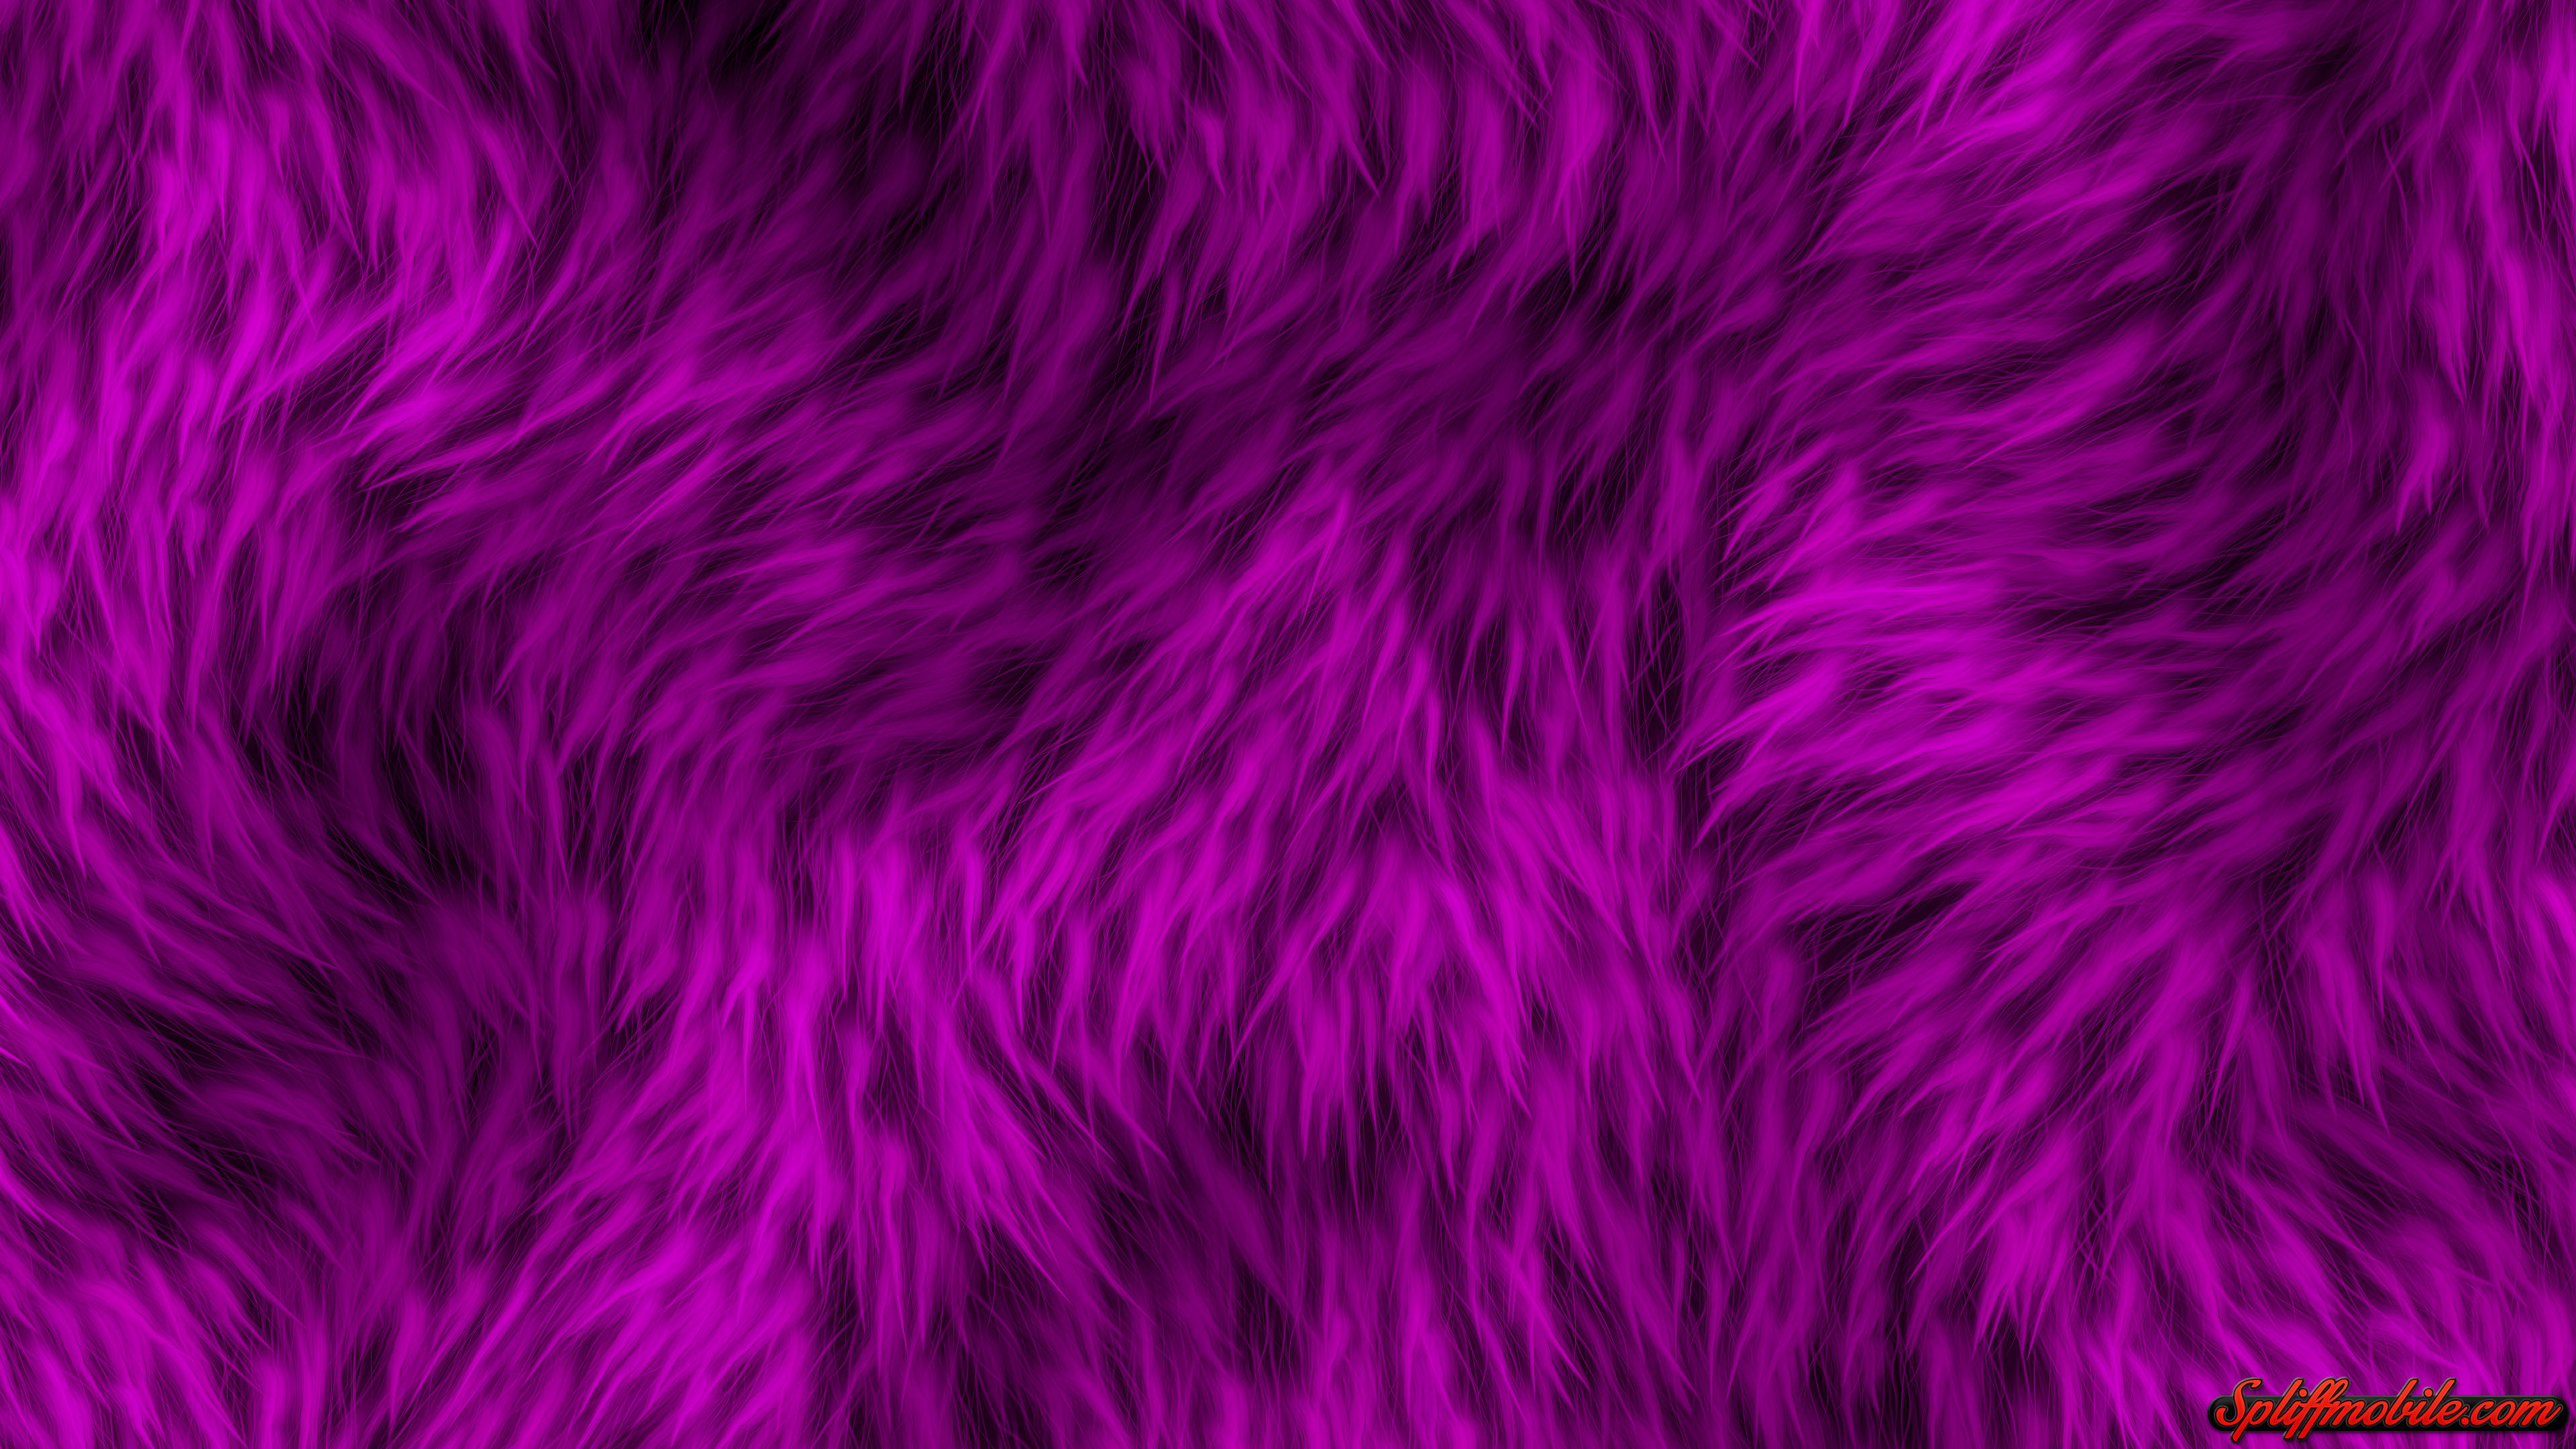 Res: 3840x2160, HD Furry Purple Wallpaper